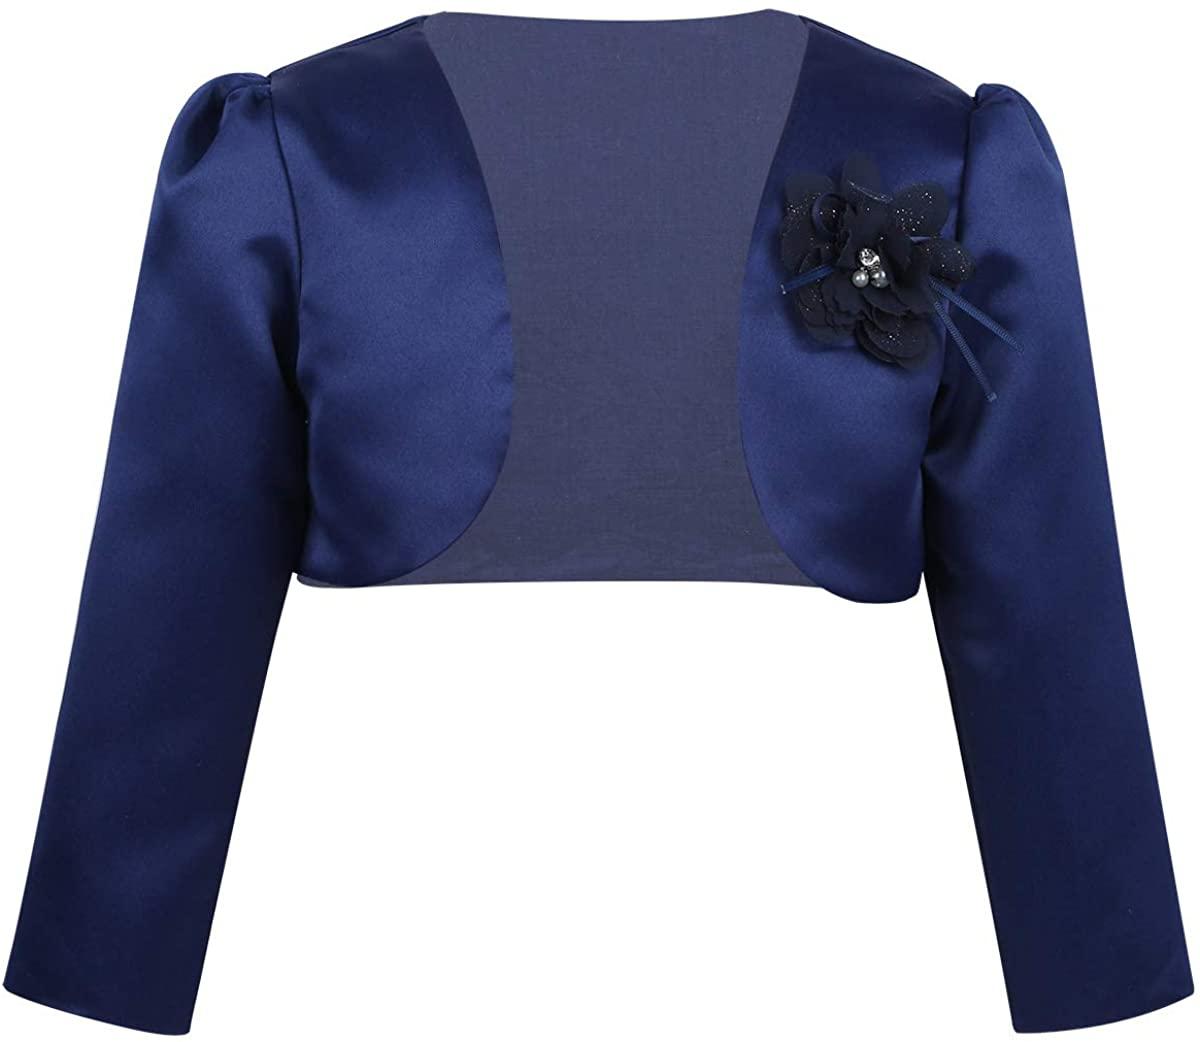 winying Kids Girls 3D Flower Long Sleeves Bolero Shrug Jacket Cardigan Bridesmaid Outerwear